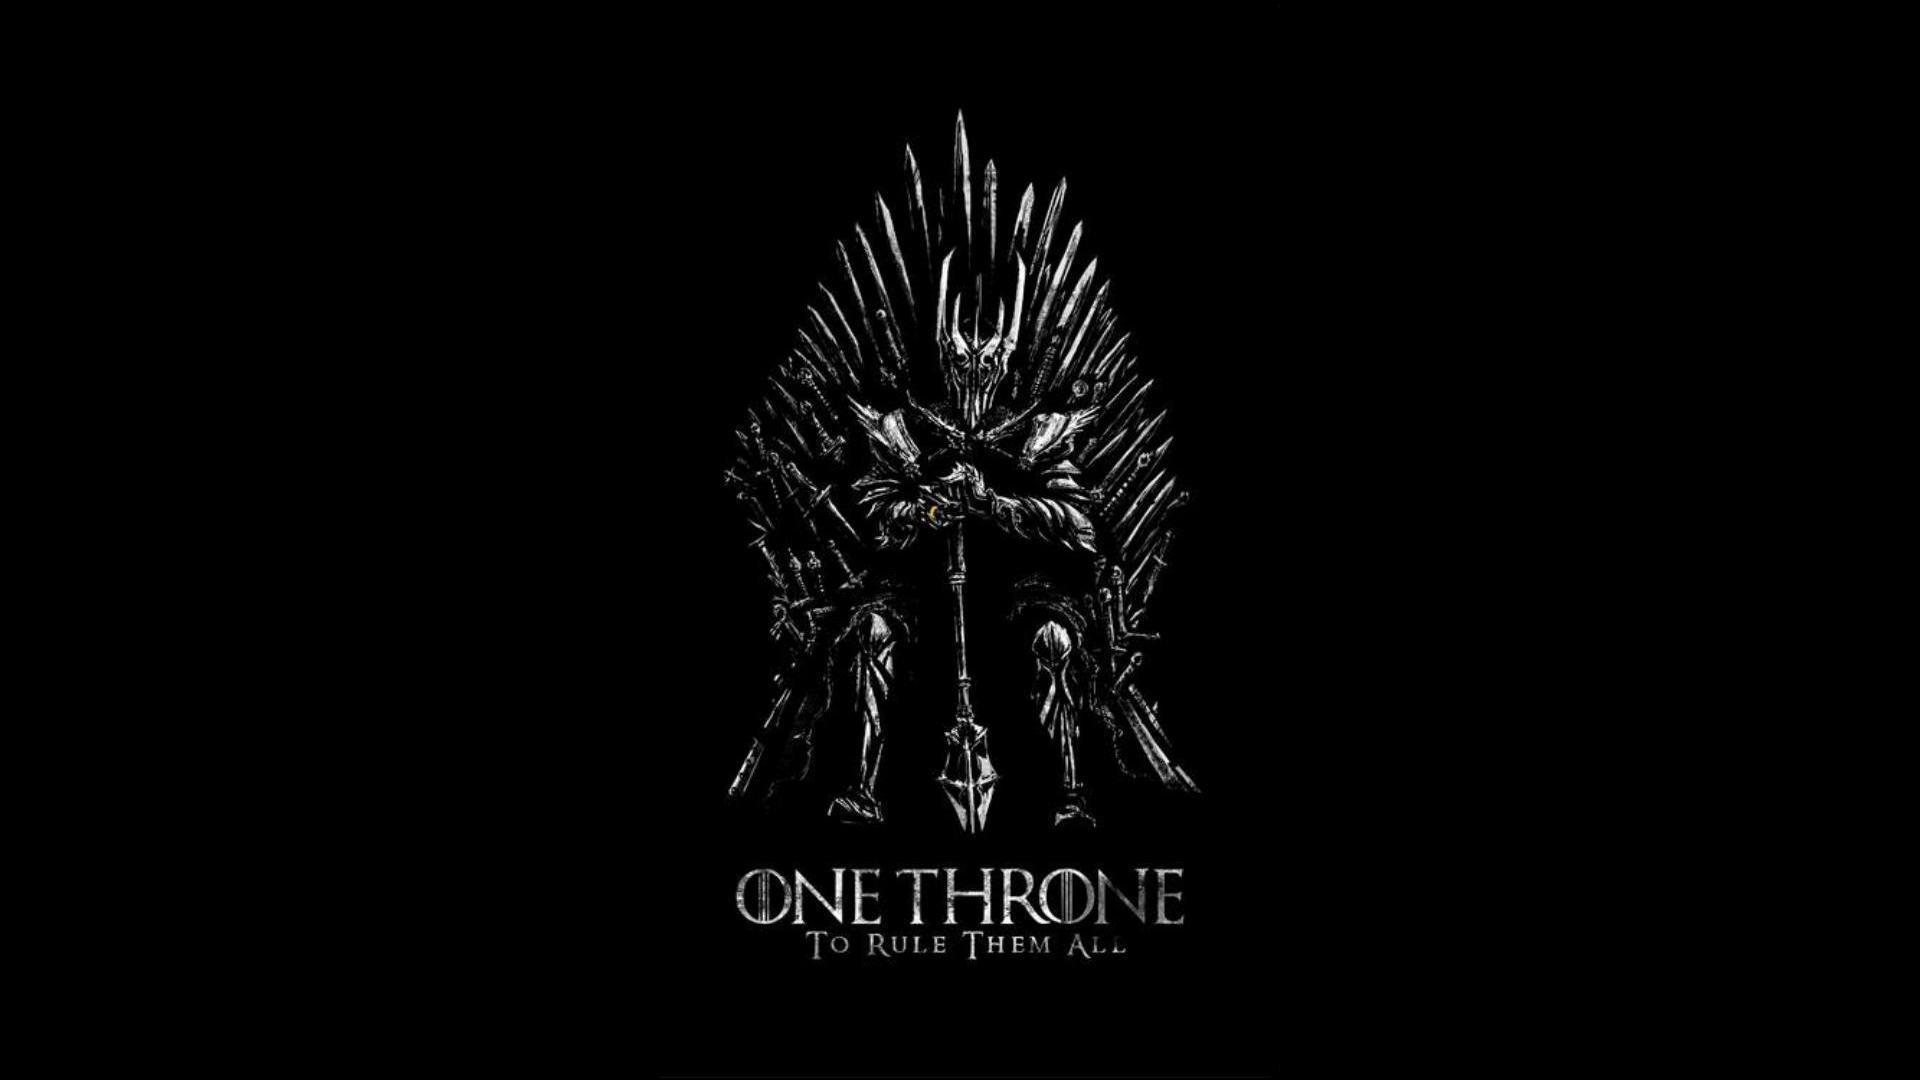 Game of thrones season 4 wallpaper voltagebd Images